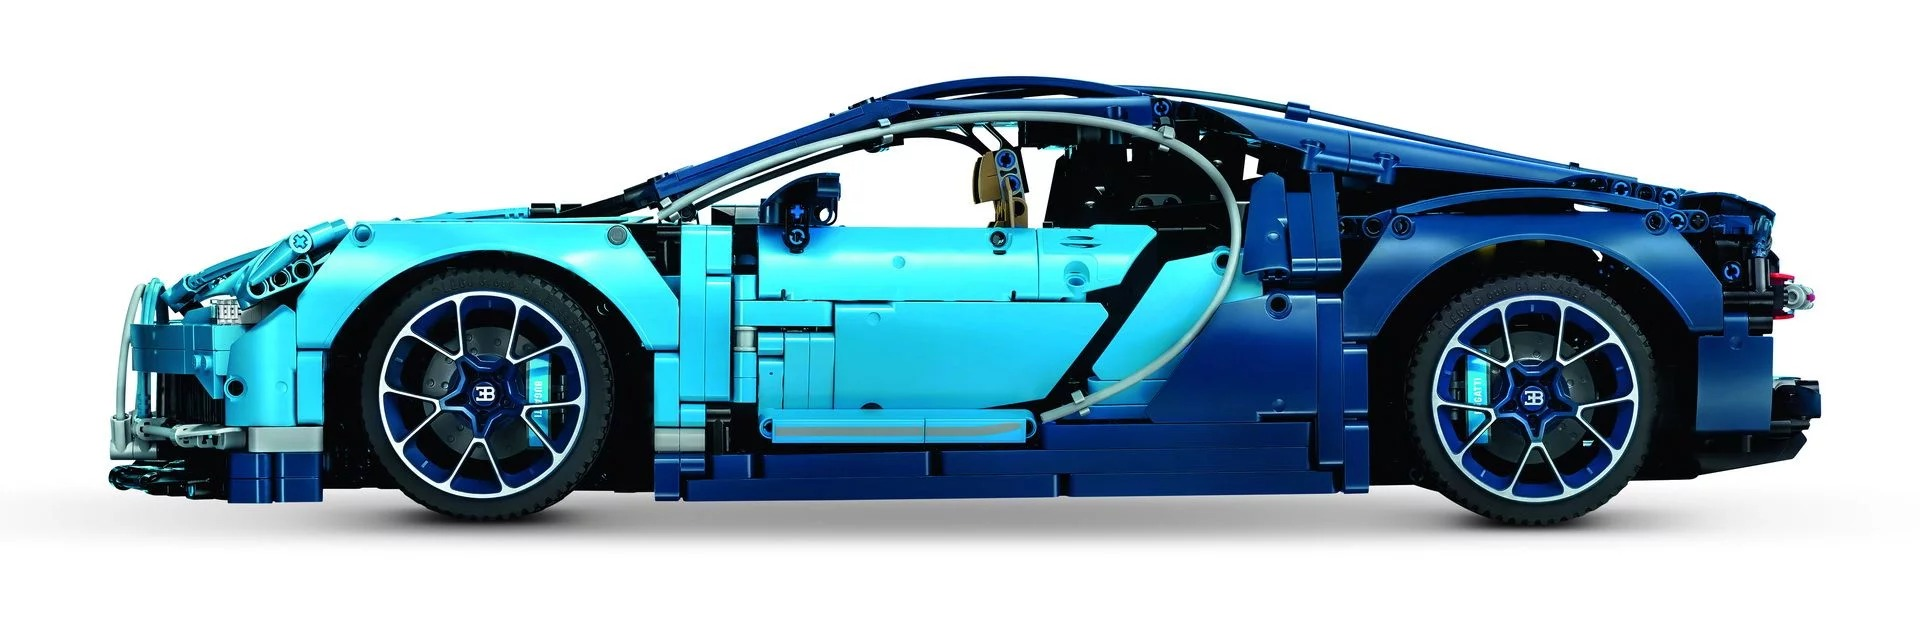 Lego Technic Reveals 3 600 Piece Bugatti Chiron And It Costs R4 500